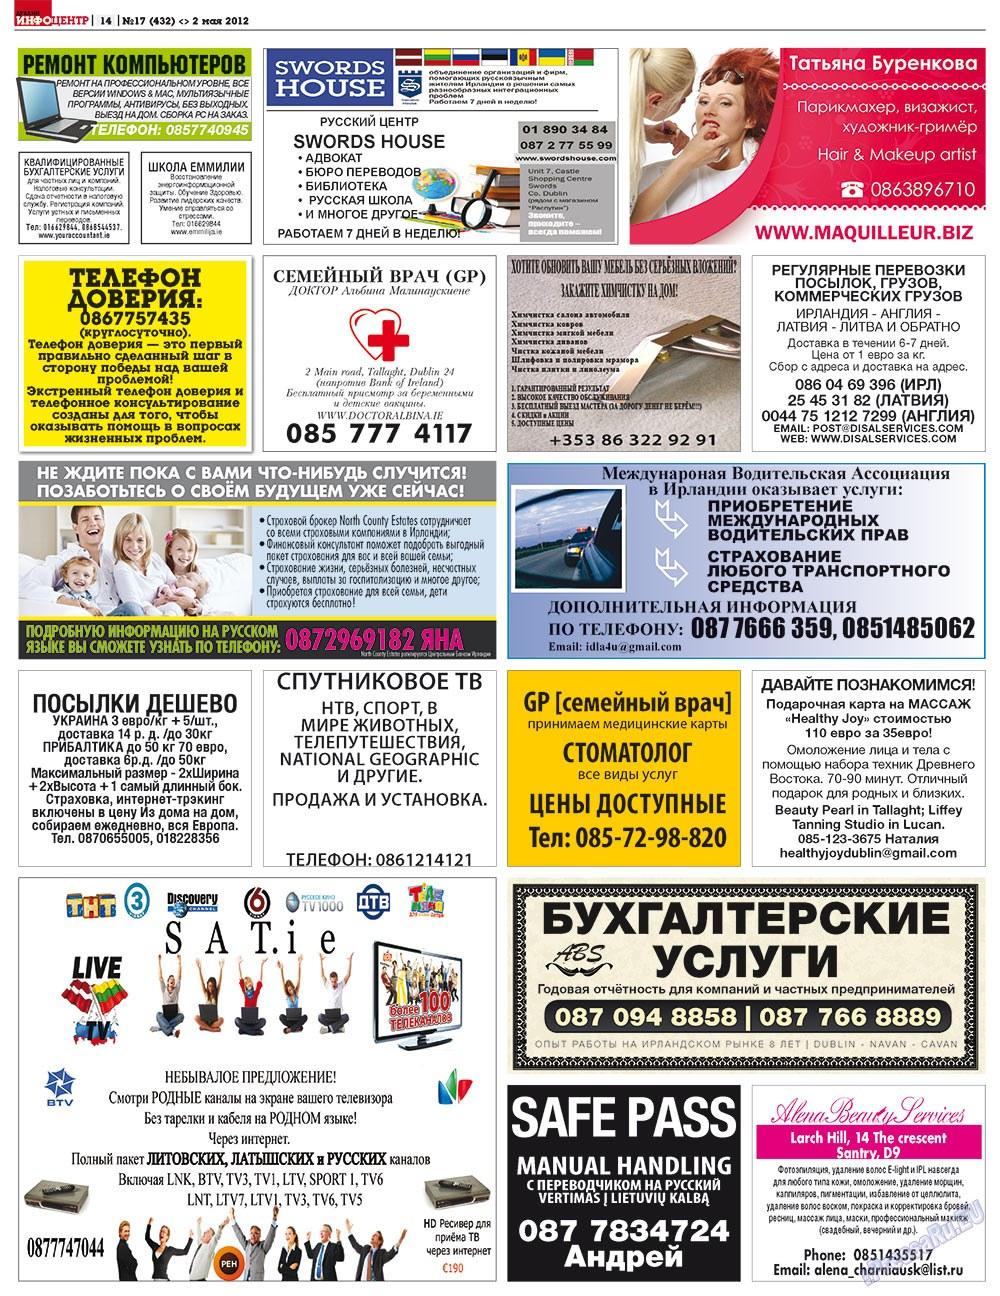 Дублин инфоцентр (газета). 2012 год, номер 17, стр. 14